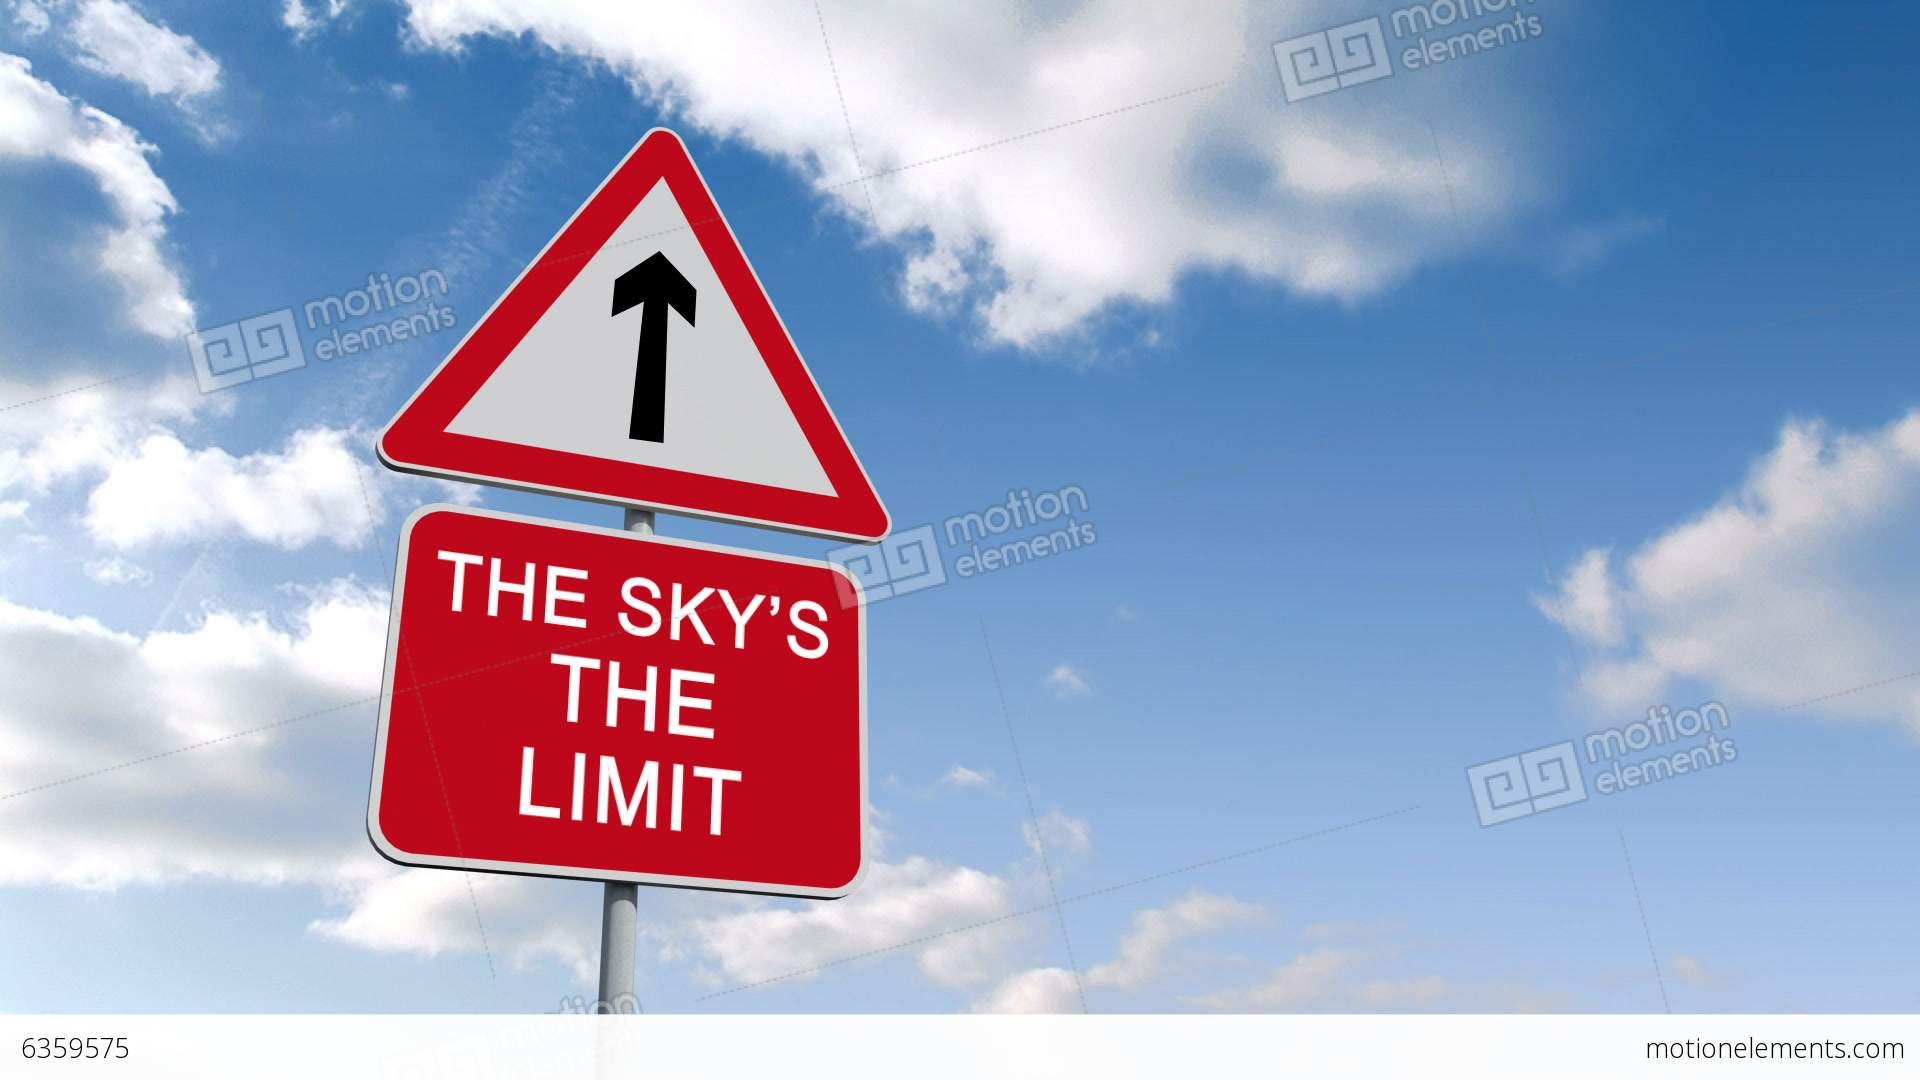 Imlorganisationse Wörterbuch The Skys The Limit Englisch